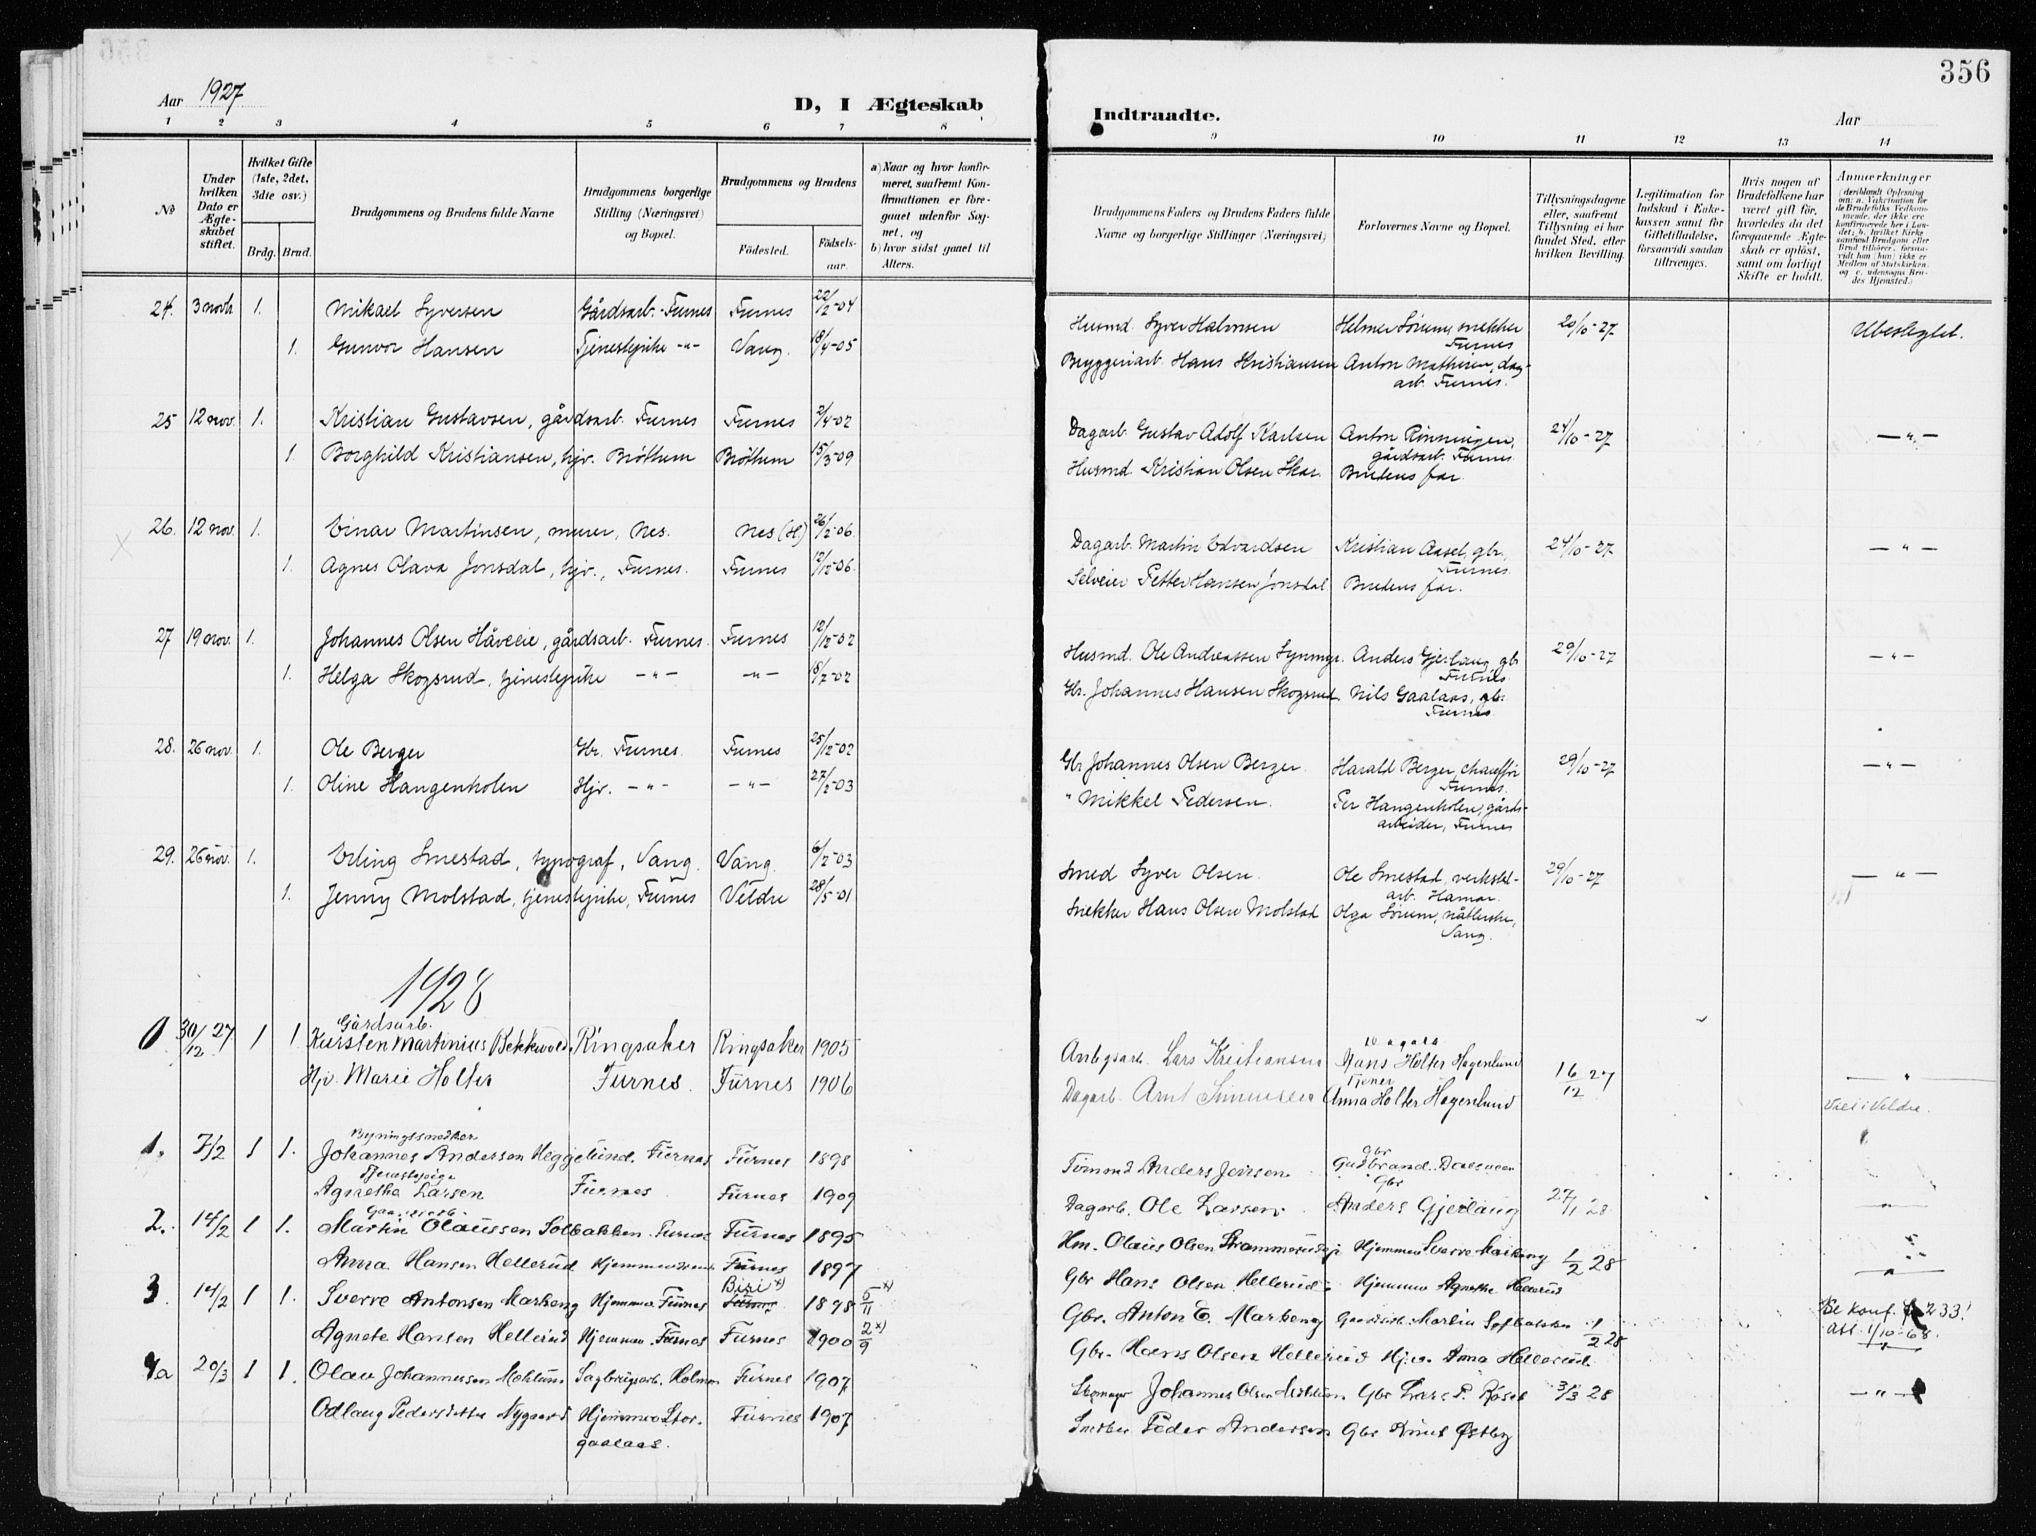 SAH, Furnes prestekontor, K/Ka/L0001: Ministerialbok nr. 1, 1907-1935, s. 356